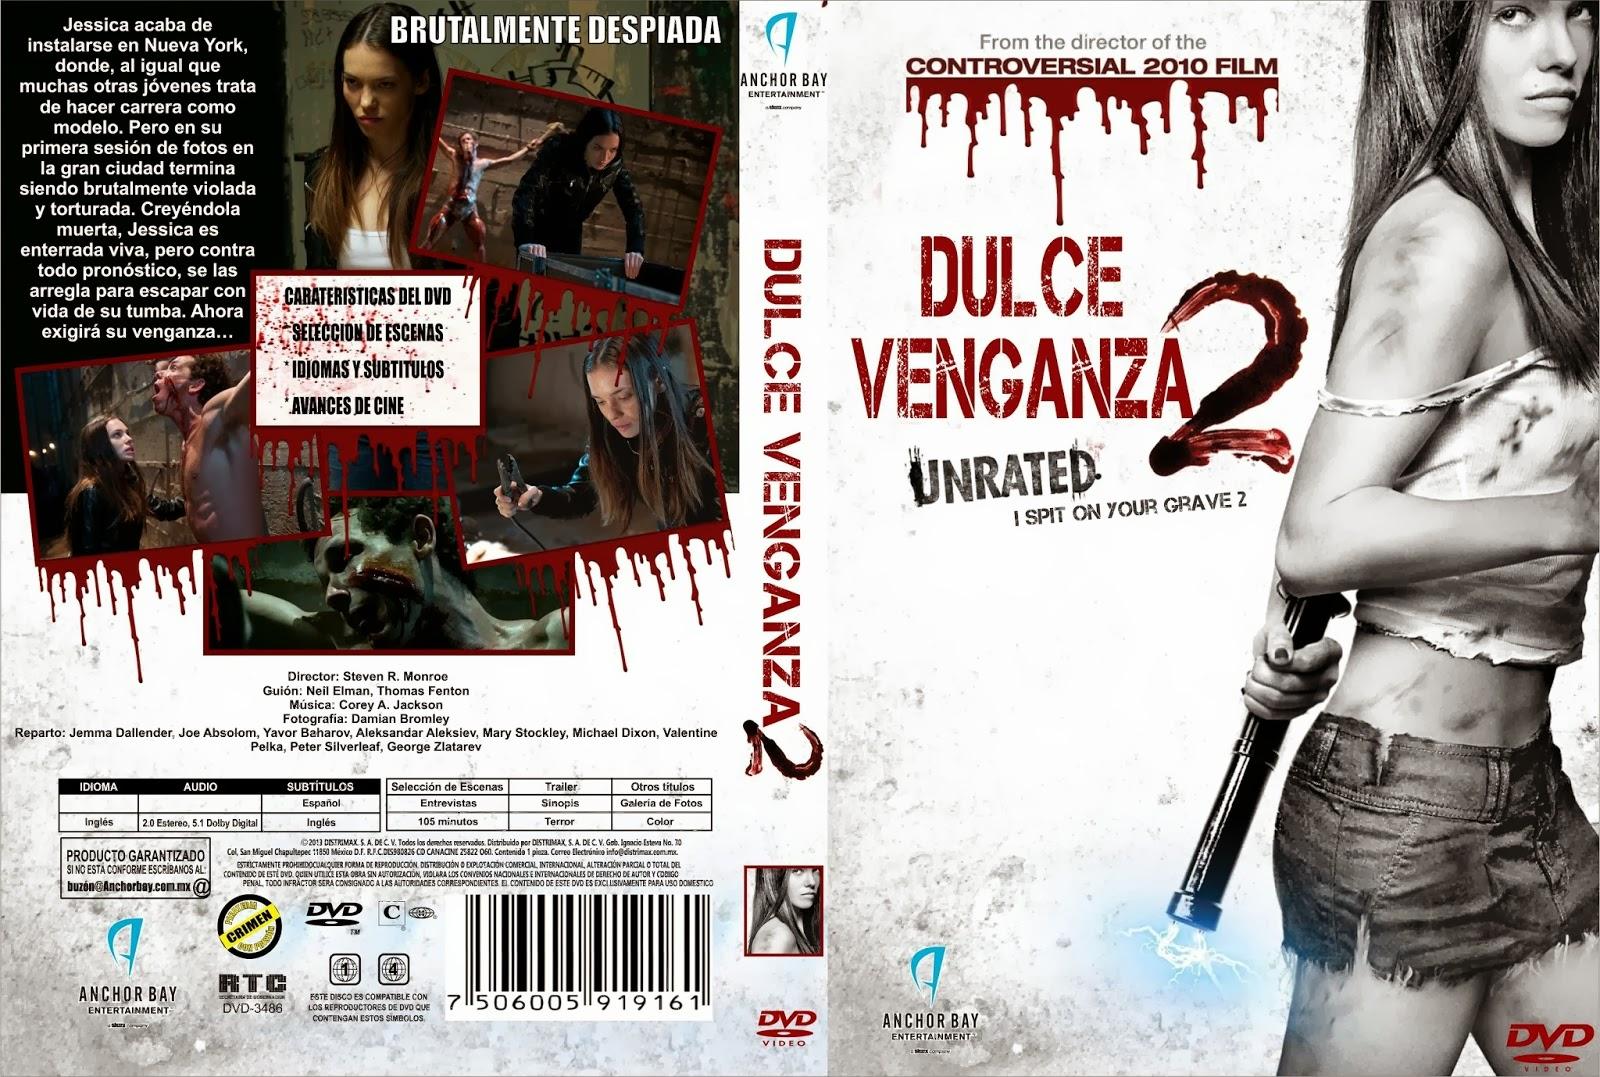 Dulce venganza 2 2013 katie es violada por georgy latinoyoutubecom - 1 2